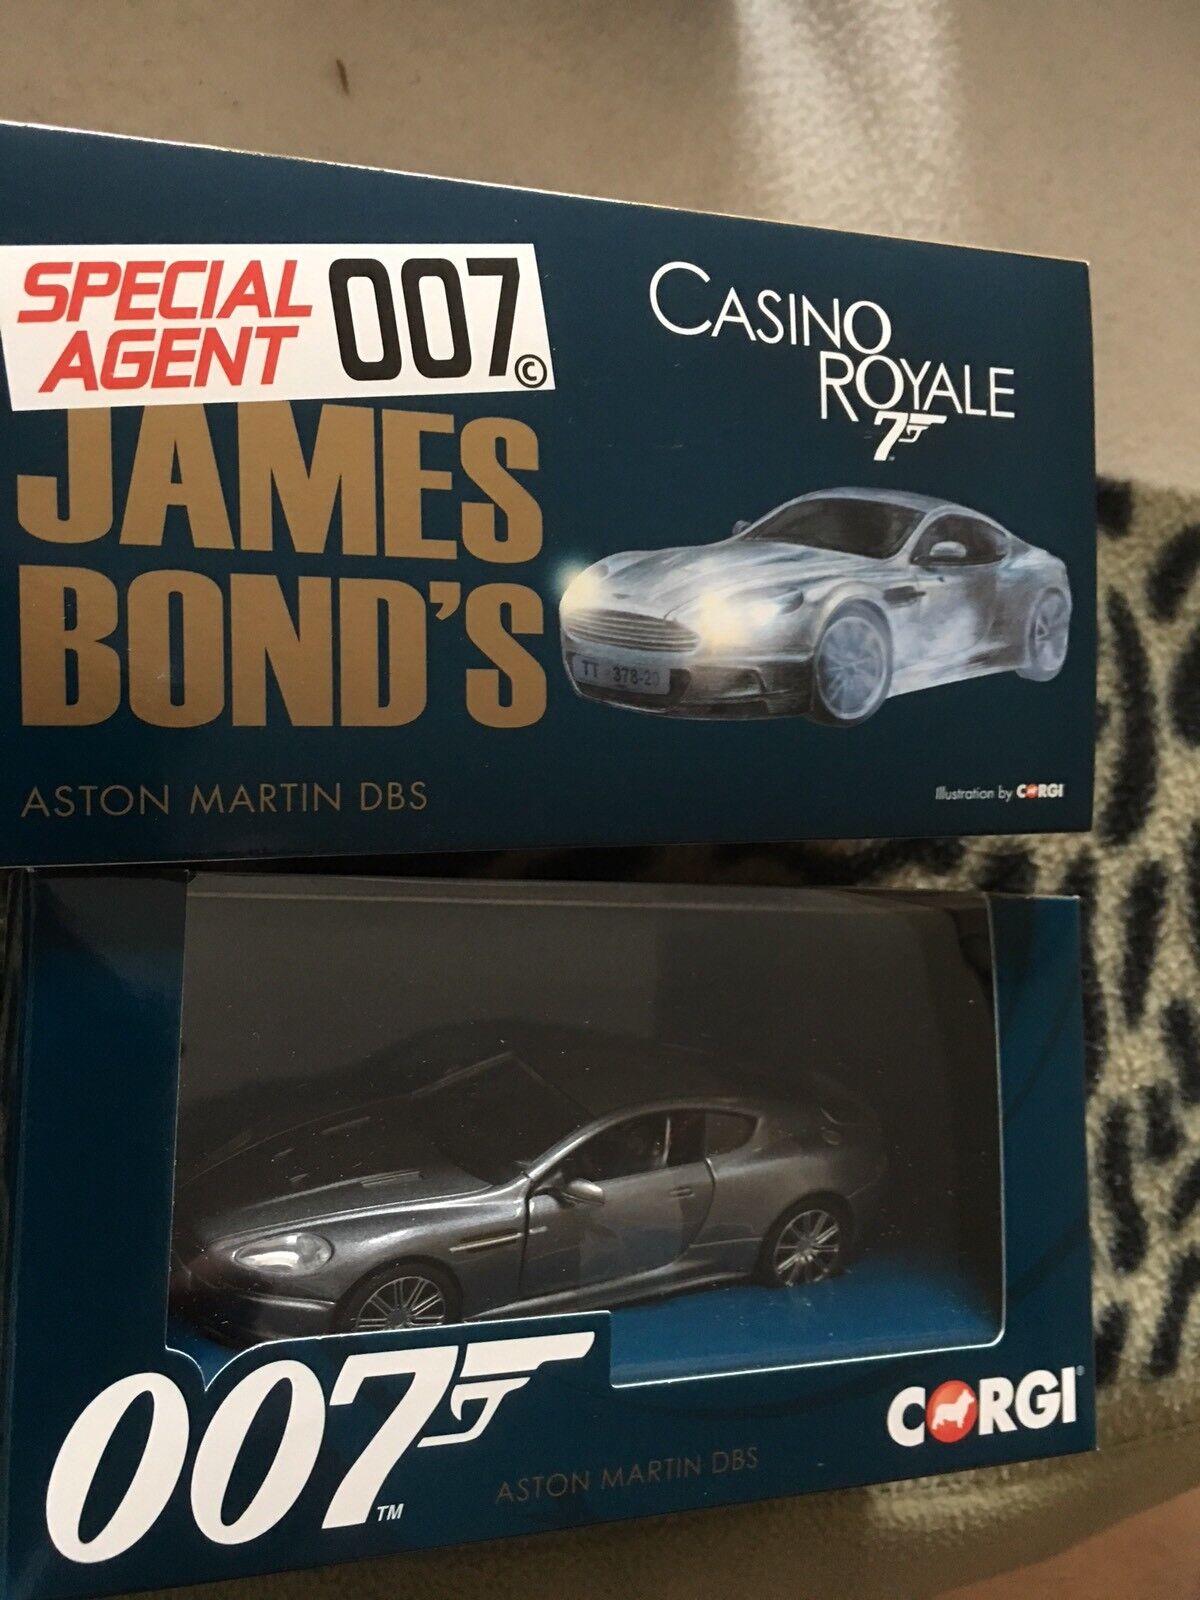 James  Bond Casino Royale Aston Martin DBS Corgi 2017 Model Car